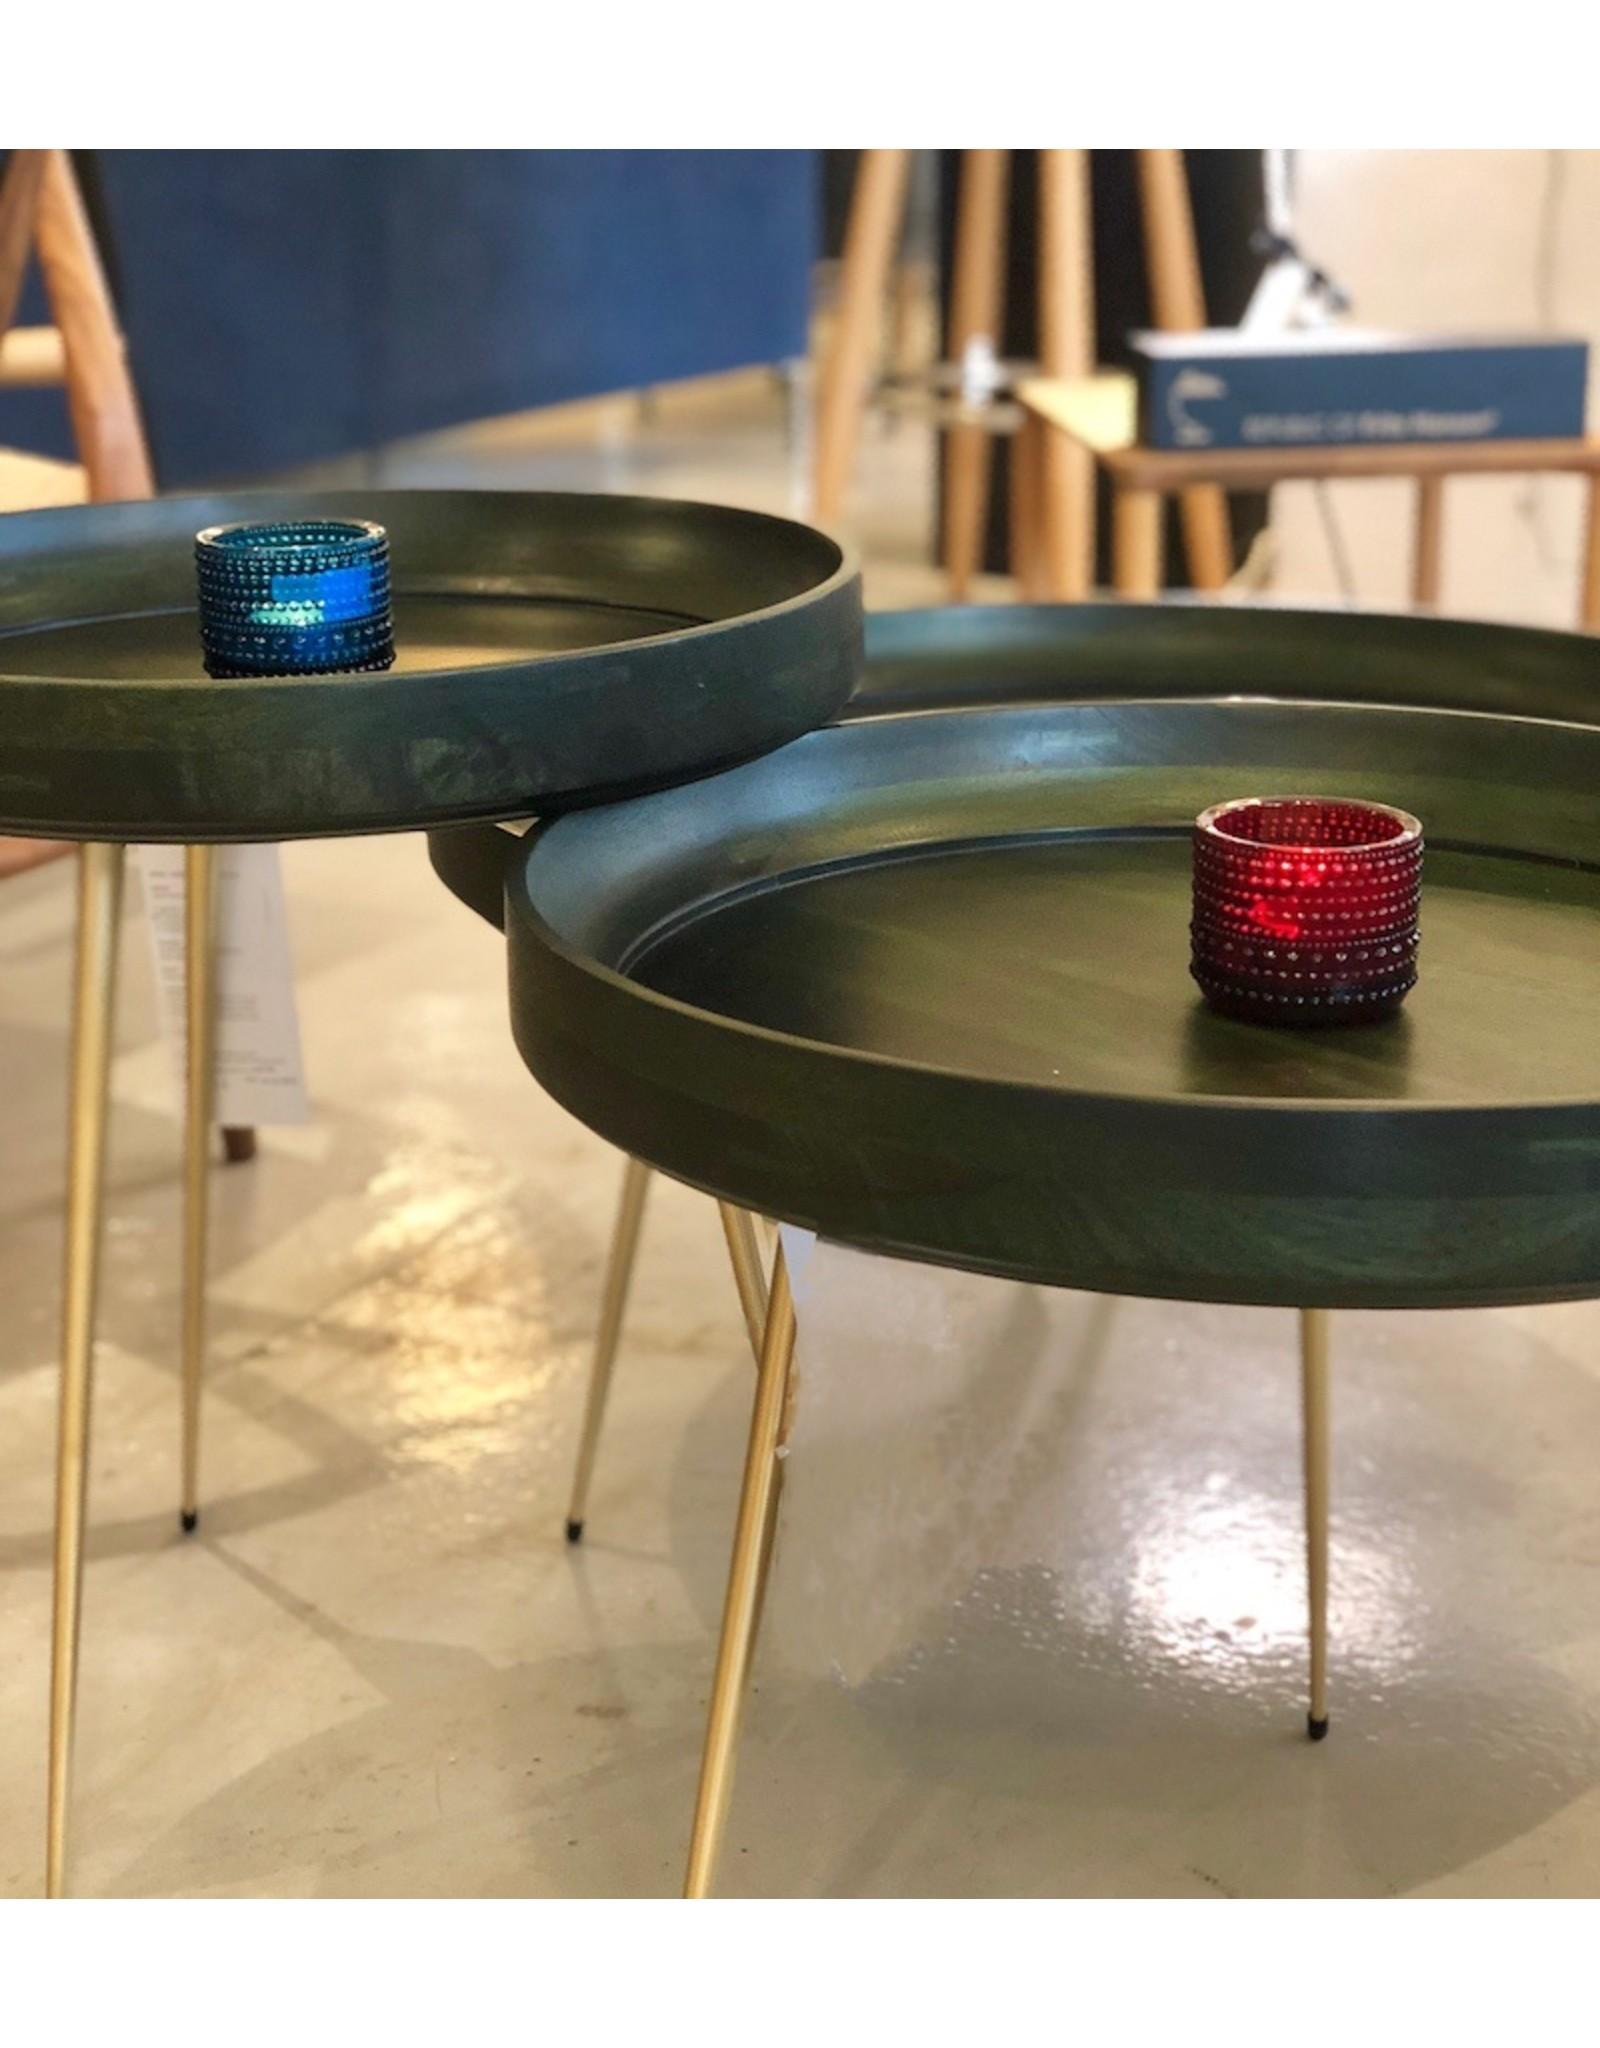 MANGO BOWL 染紫菜绿色芒果木边桌